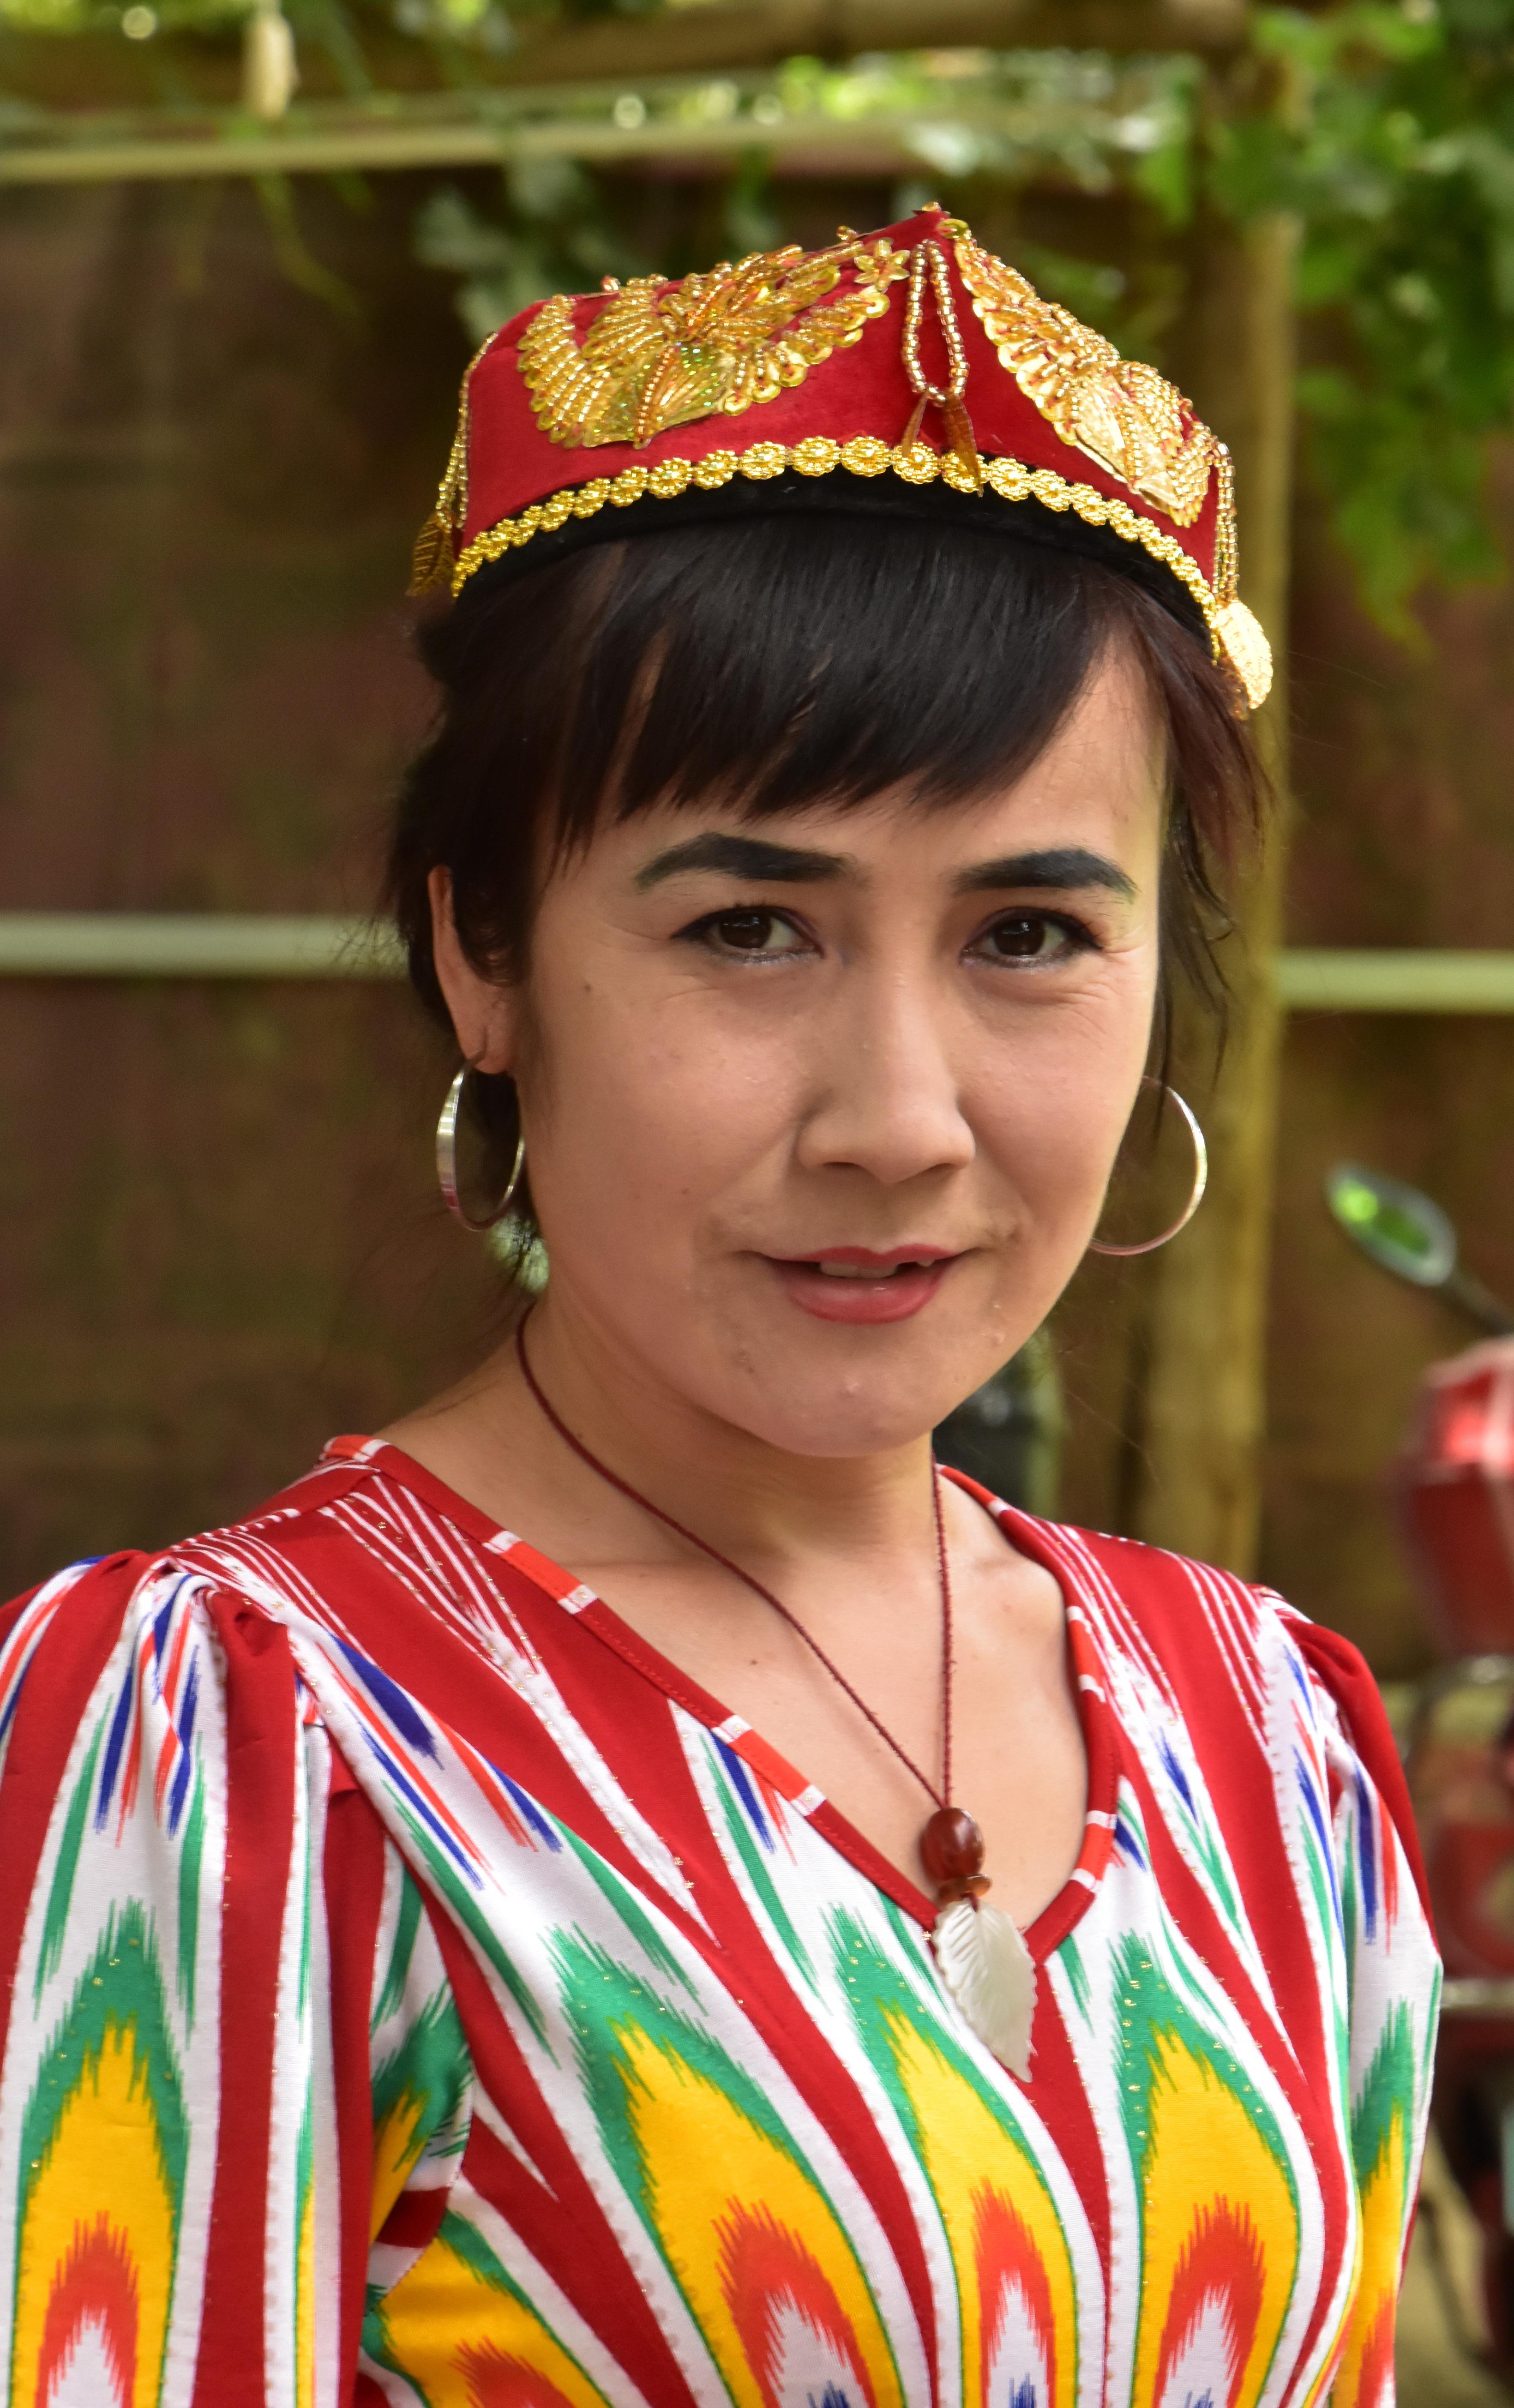 סין - גברת צבעונית